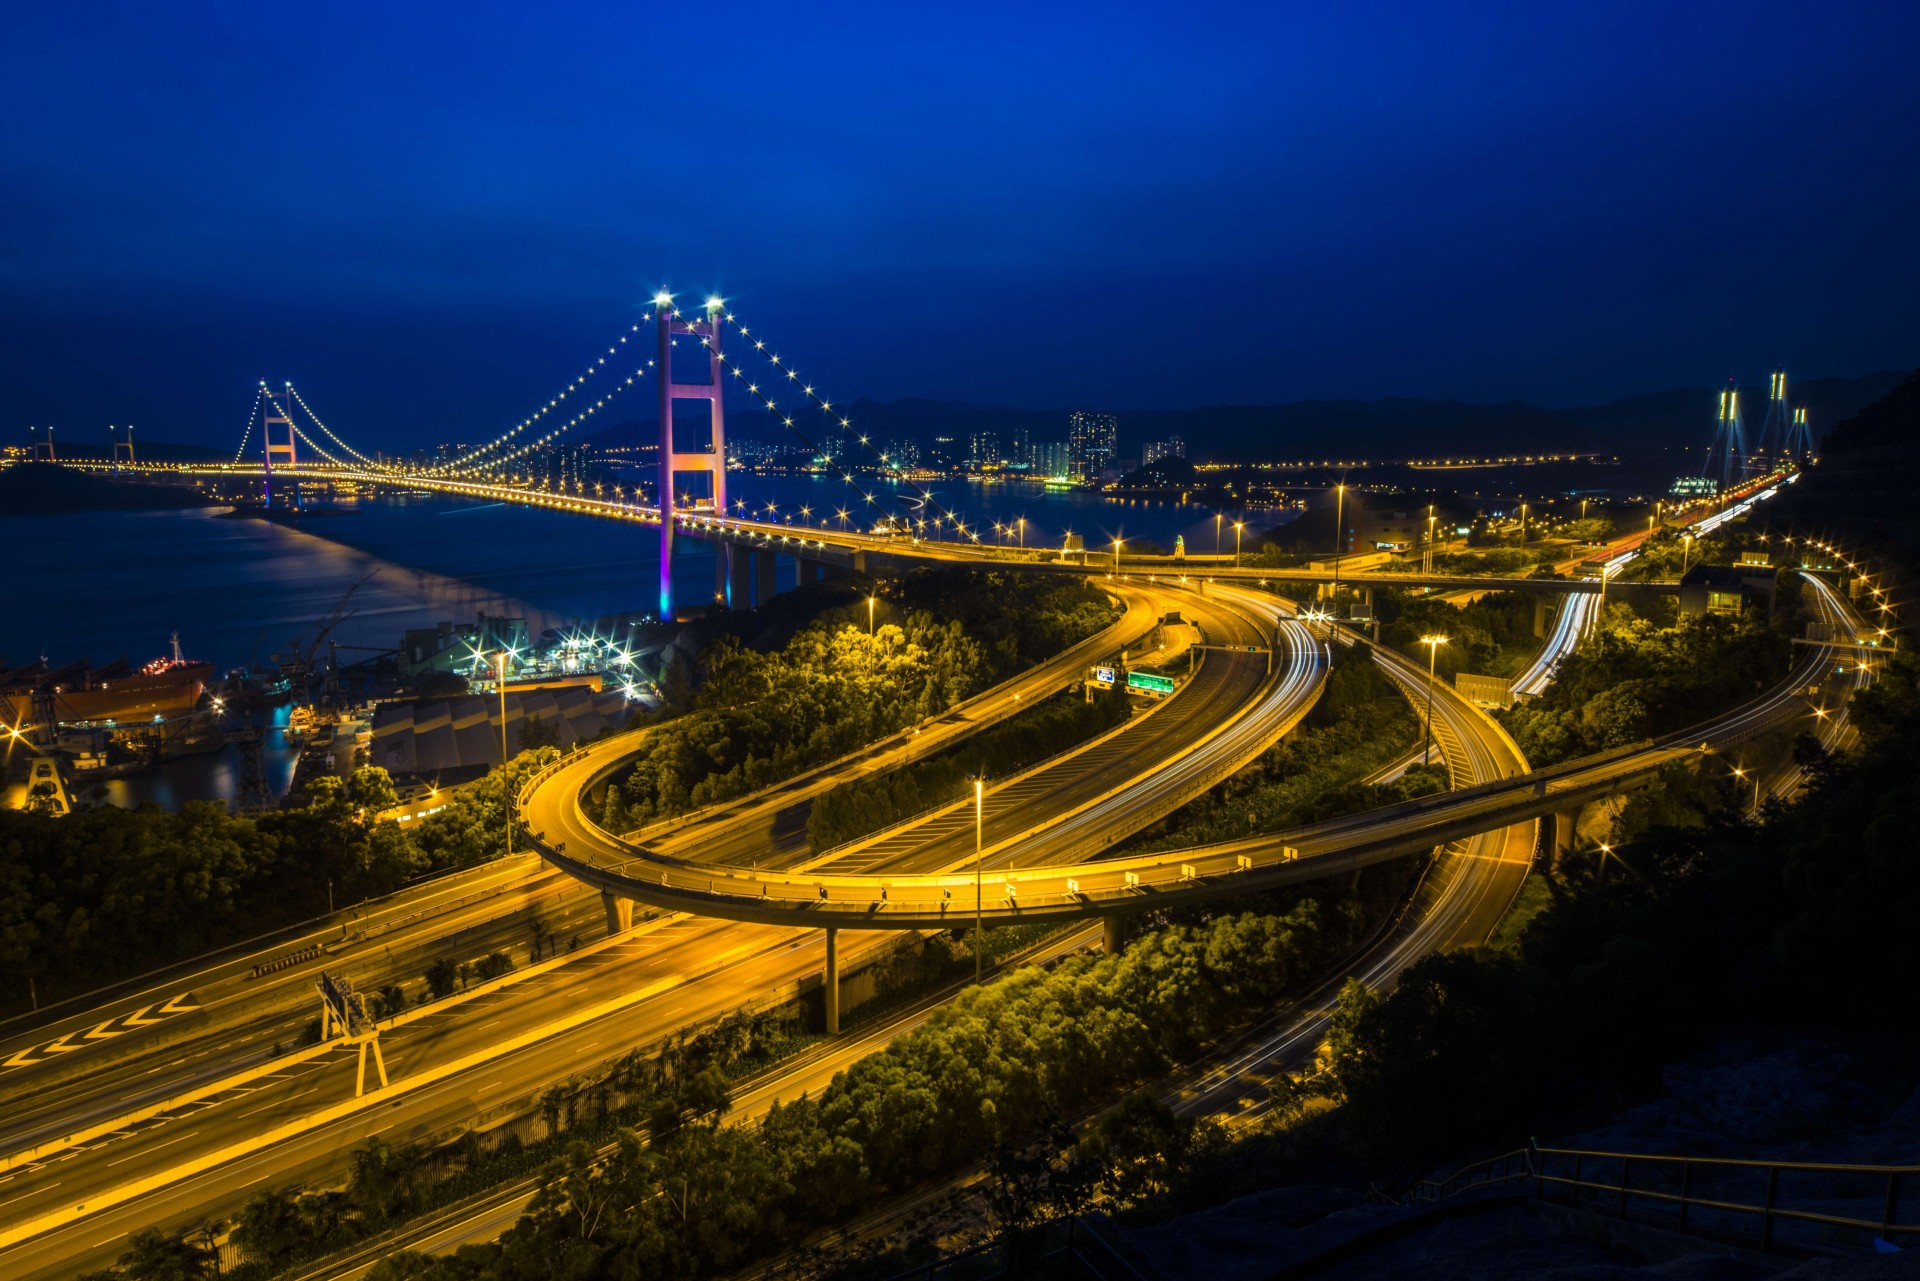 Картинка ночного моста